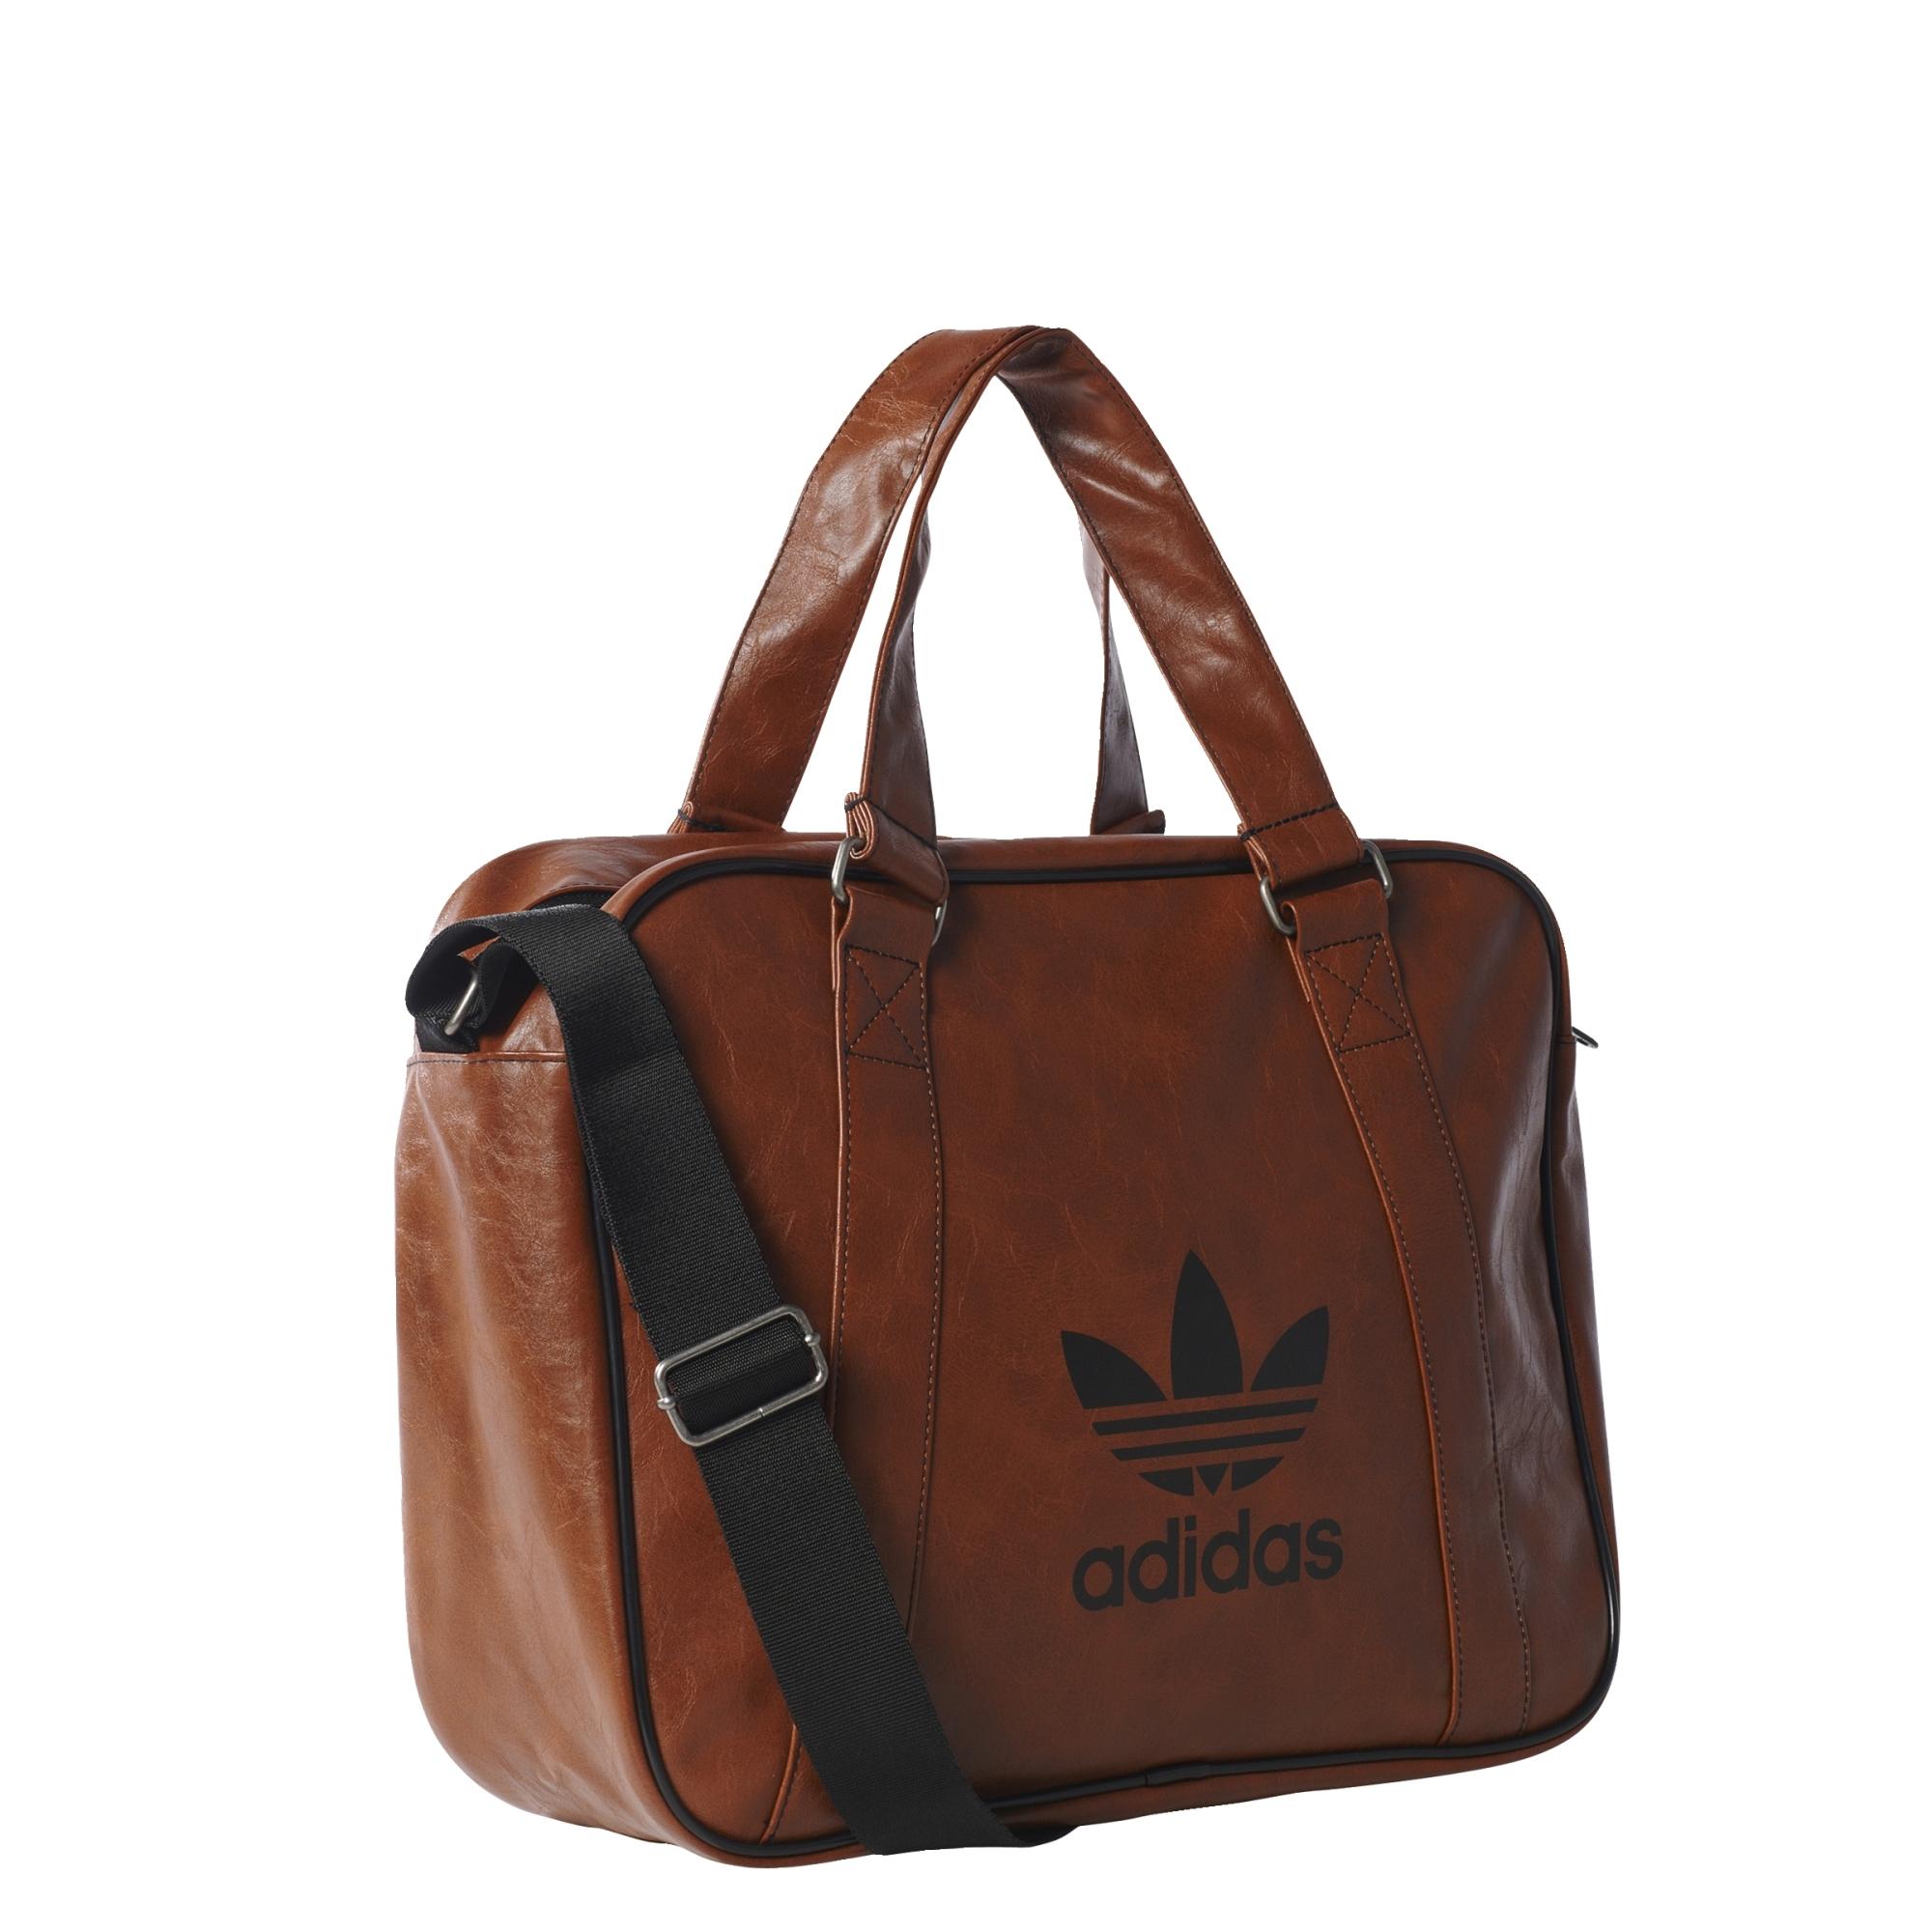 Adidas Originals Vintage Airliner Bag (dust rust). Oferta 15% b4b9871d67da6